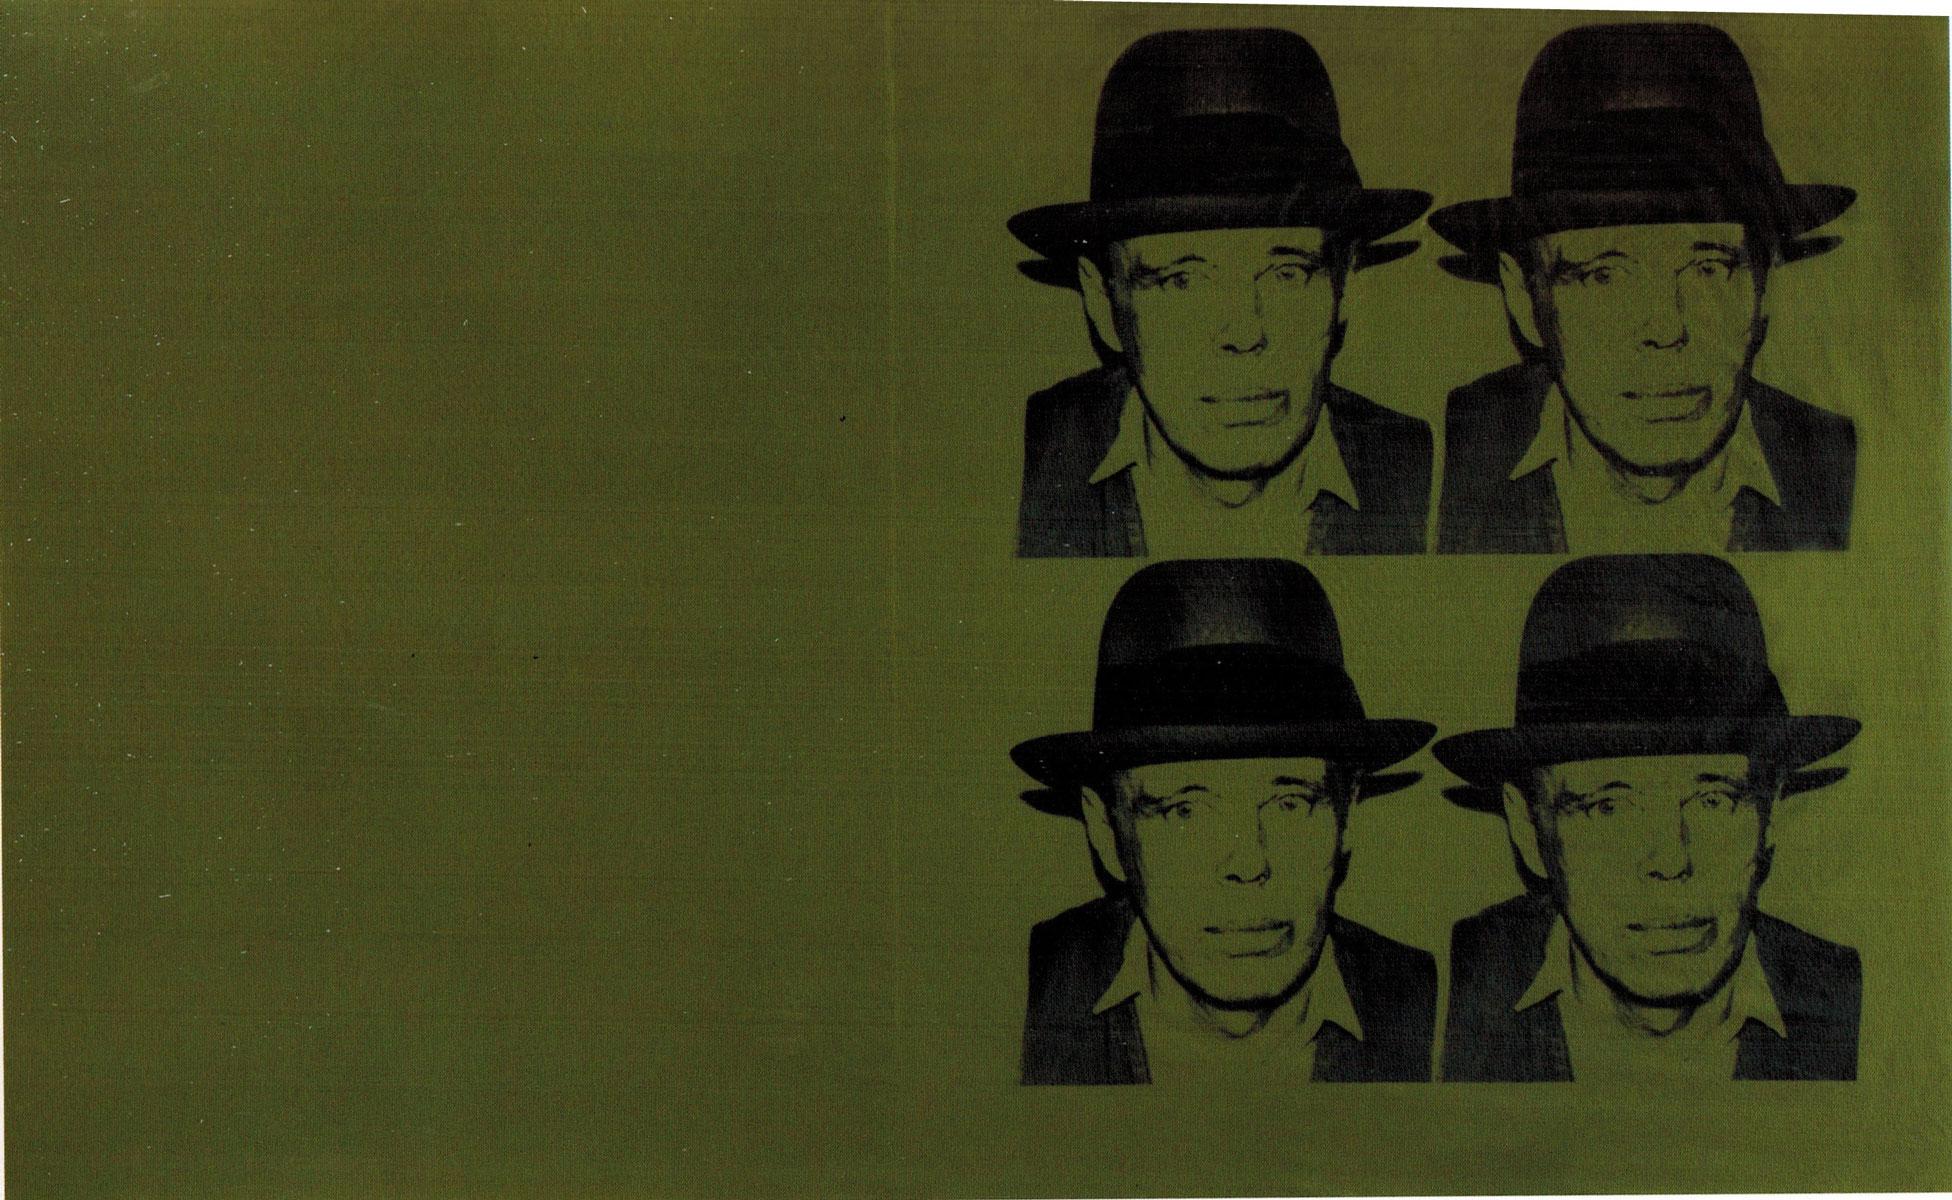 Beuys Laundry Bag. 1980. serigrafia su tela. cm 117 x 187. Pezzo unico